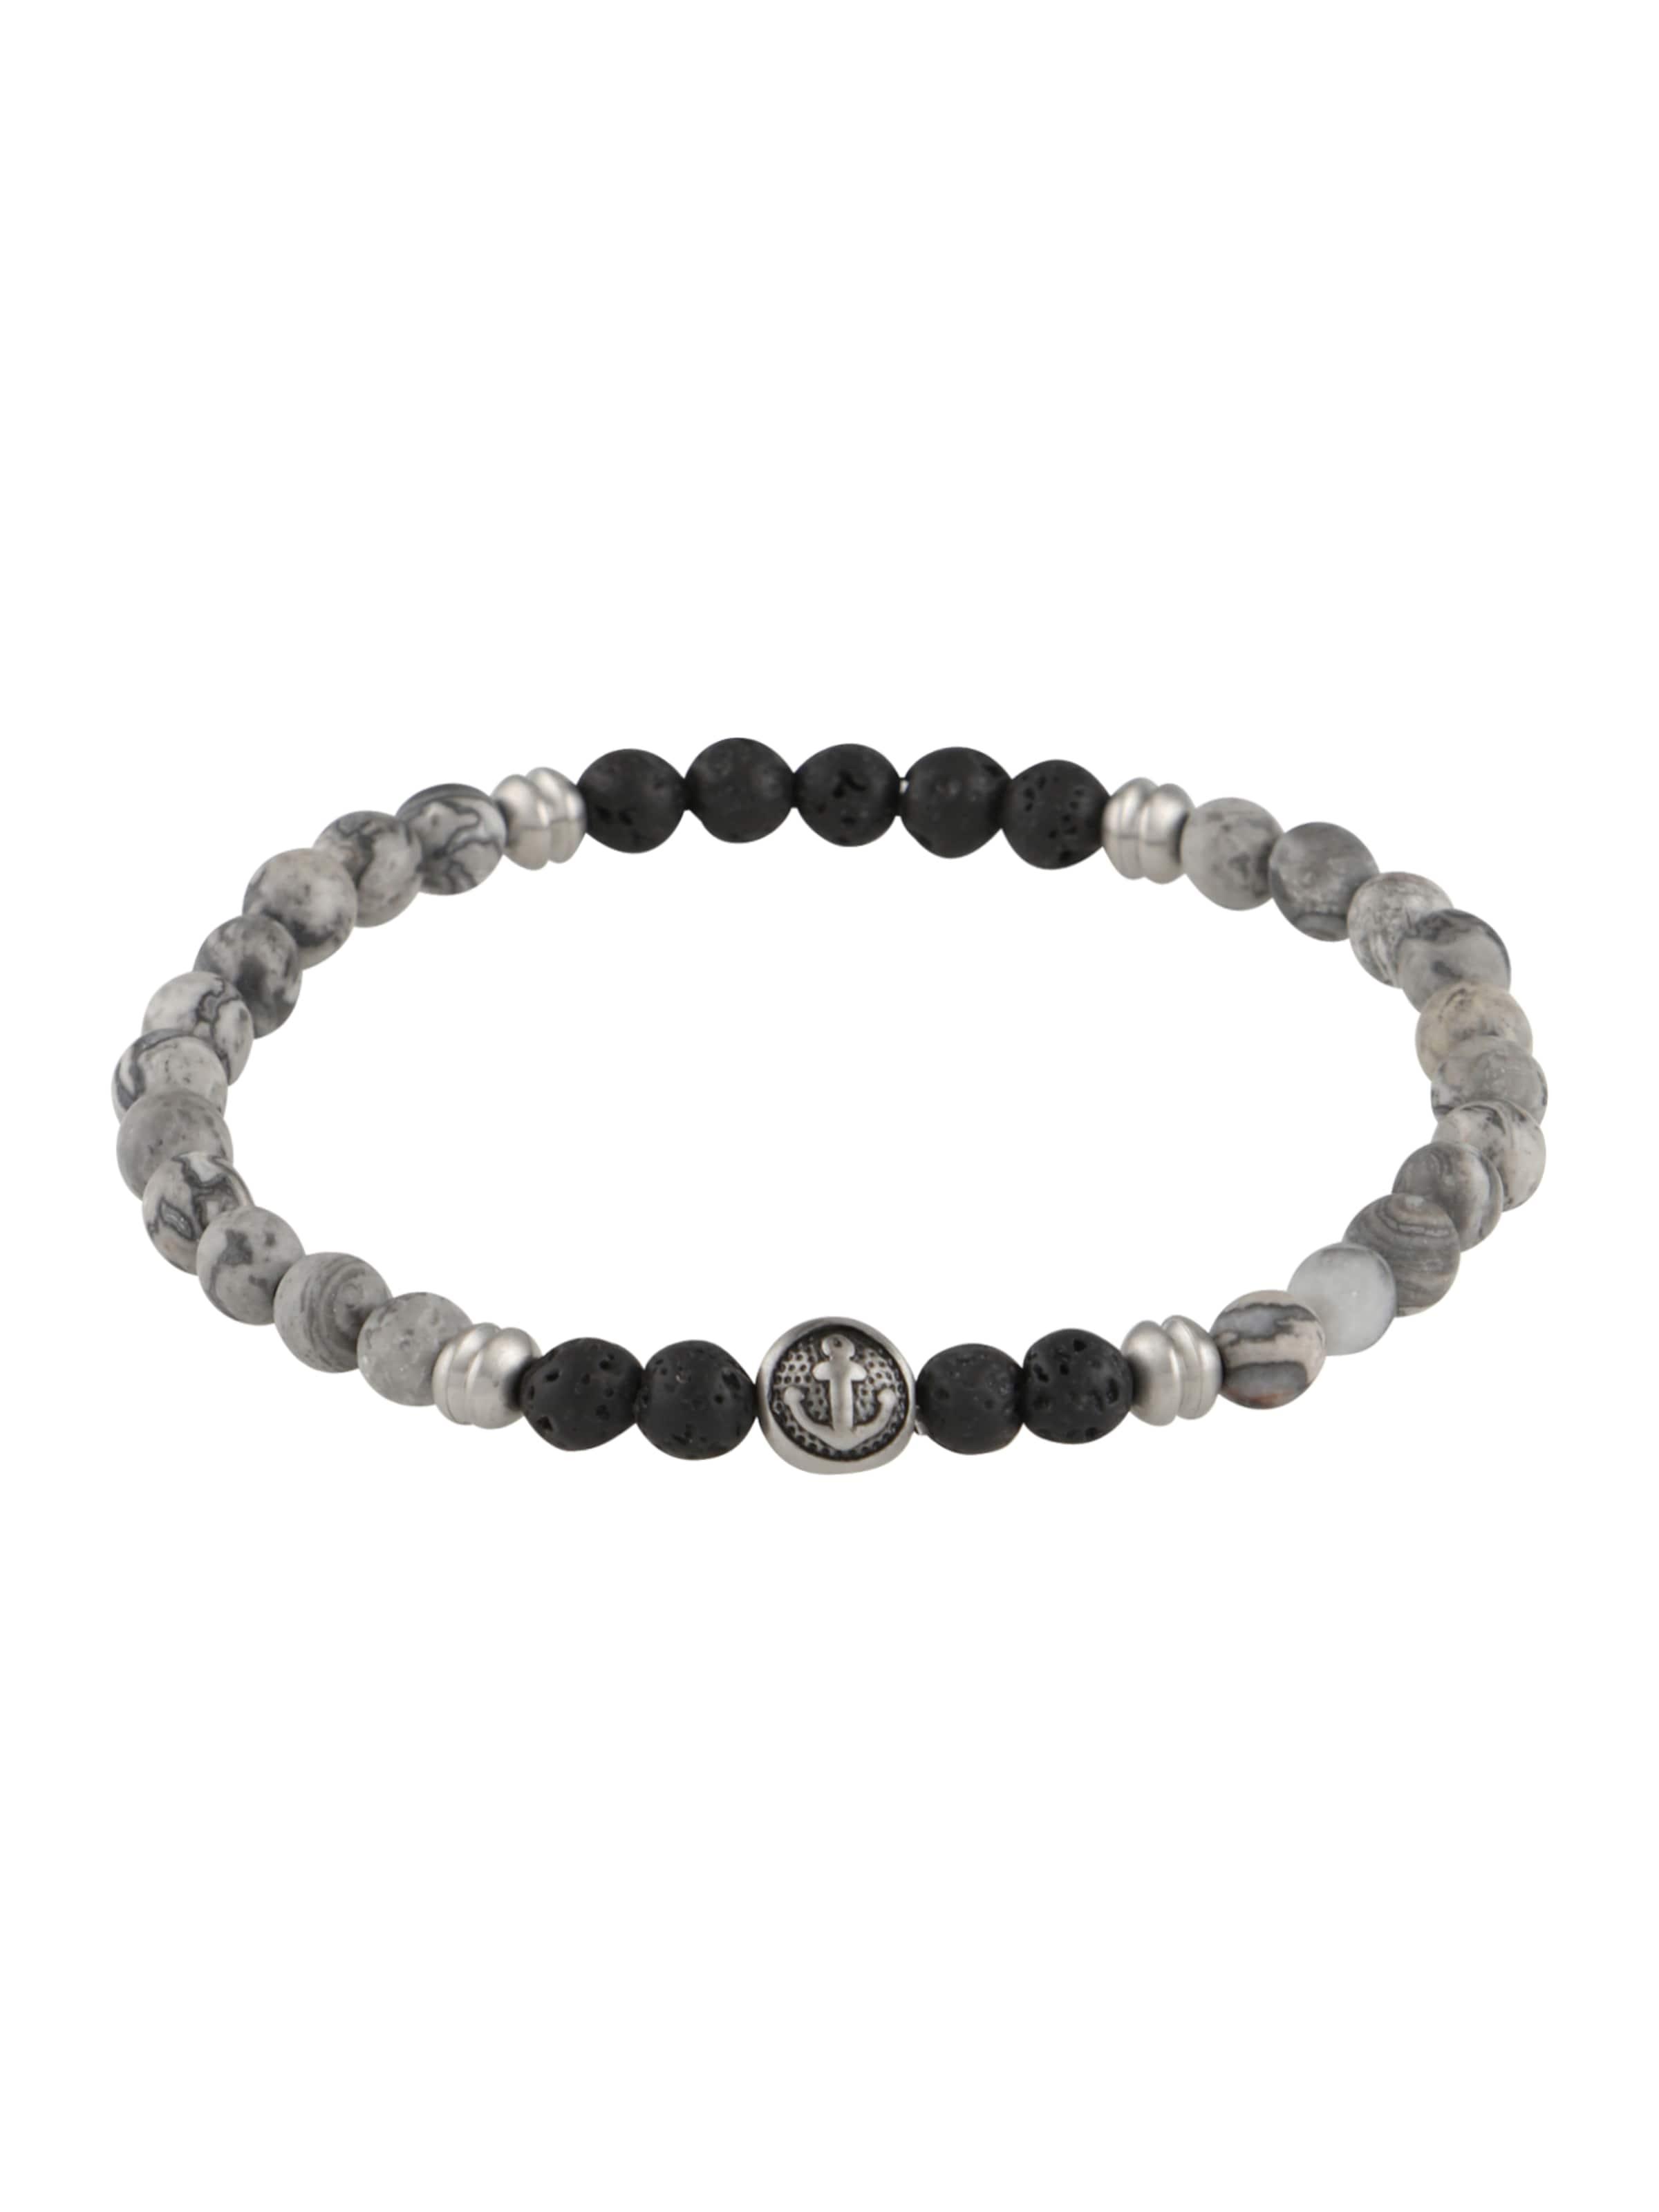 Royal In Armband GrijsZwart ego 'bracelet' EDYWH92I